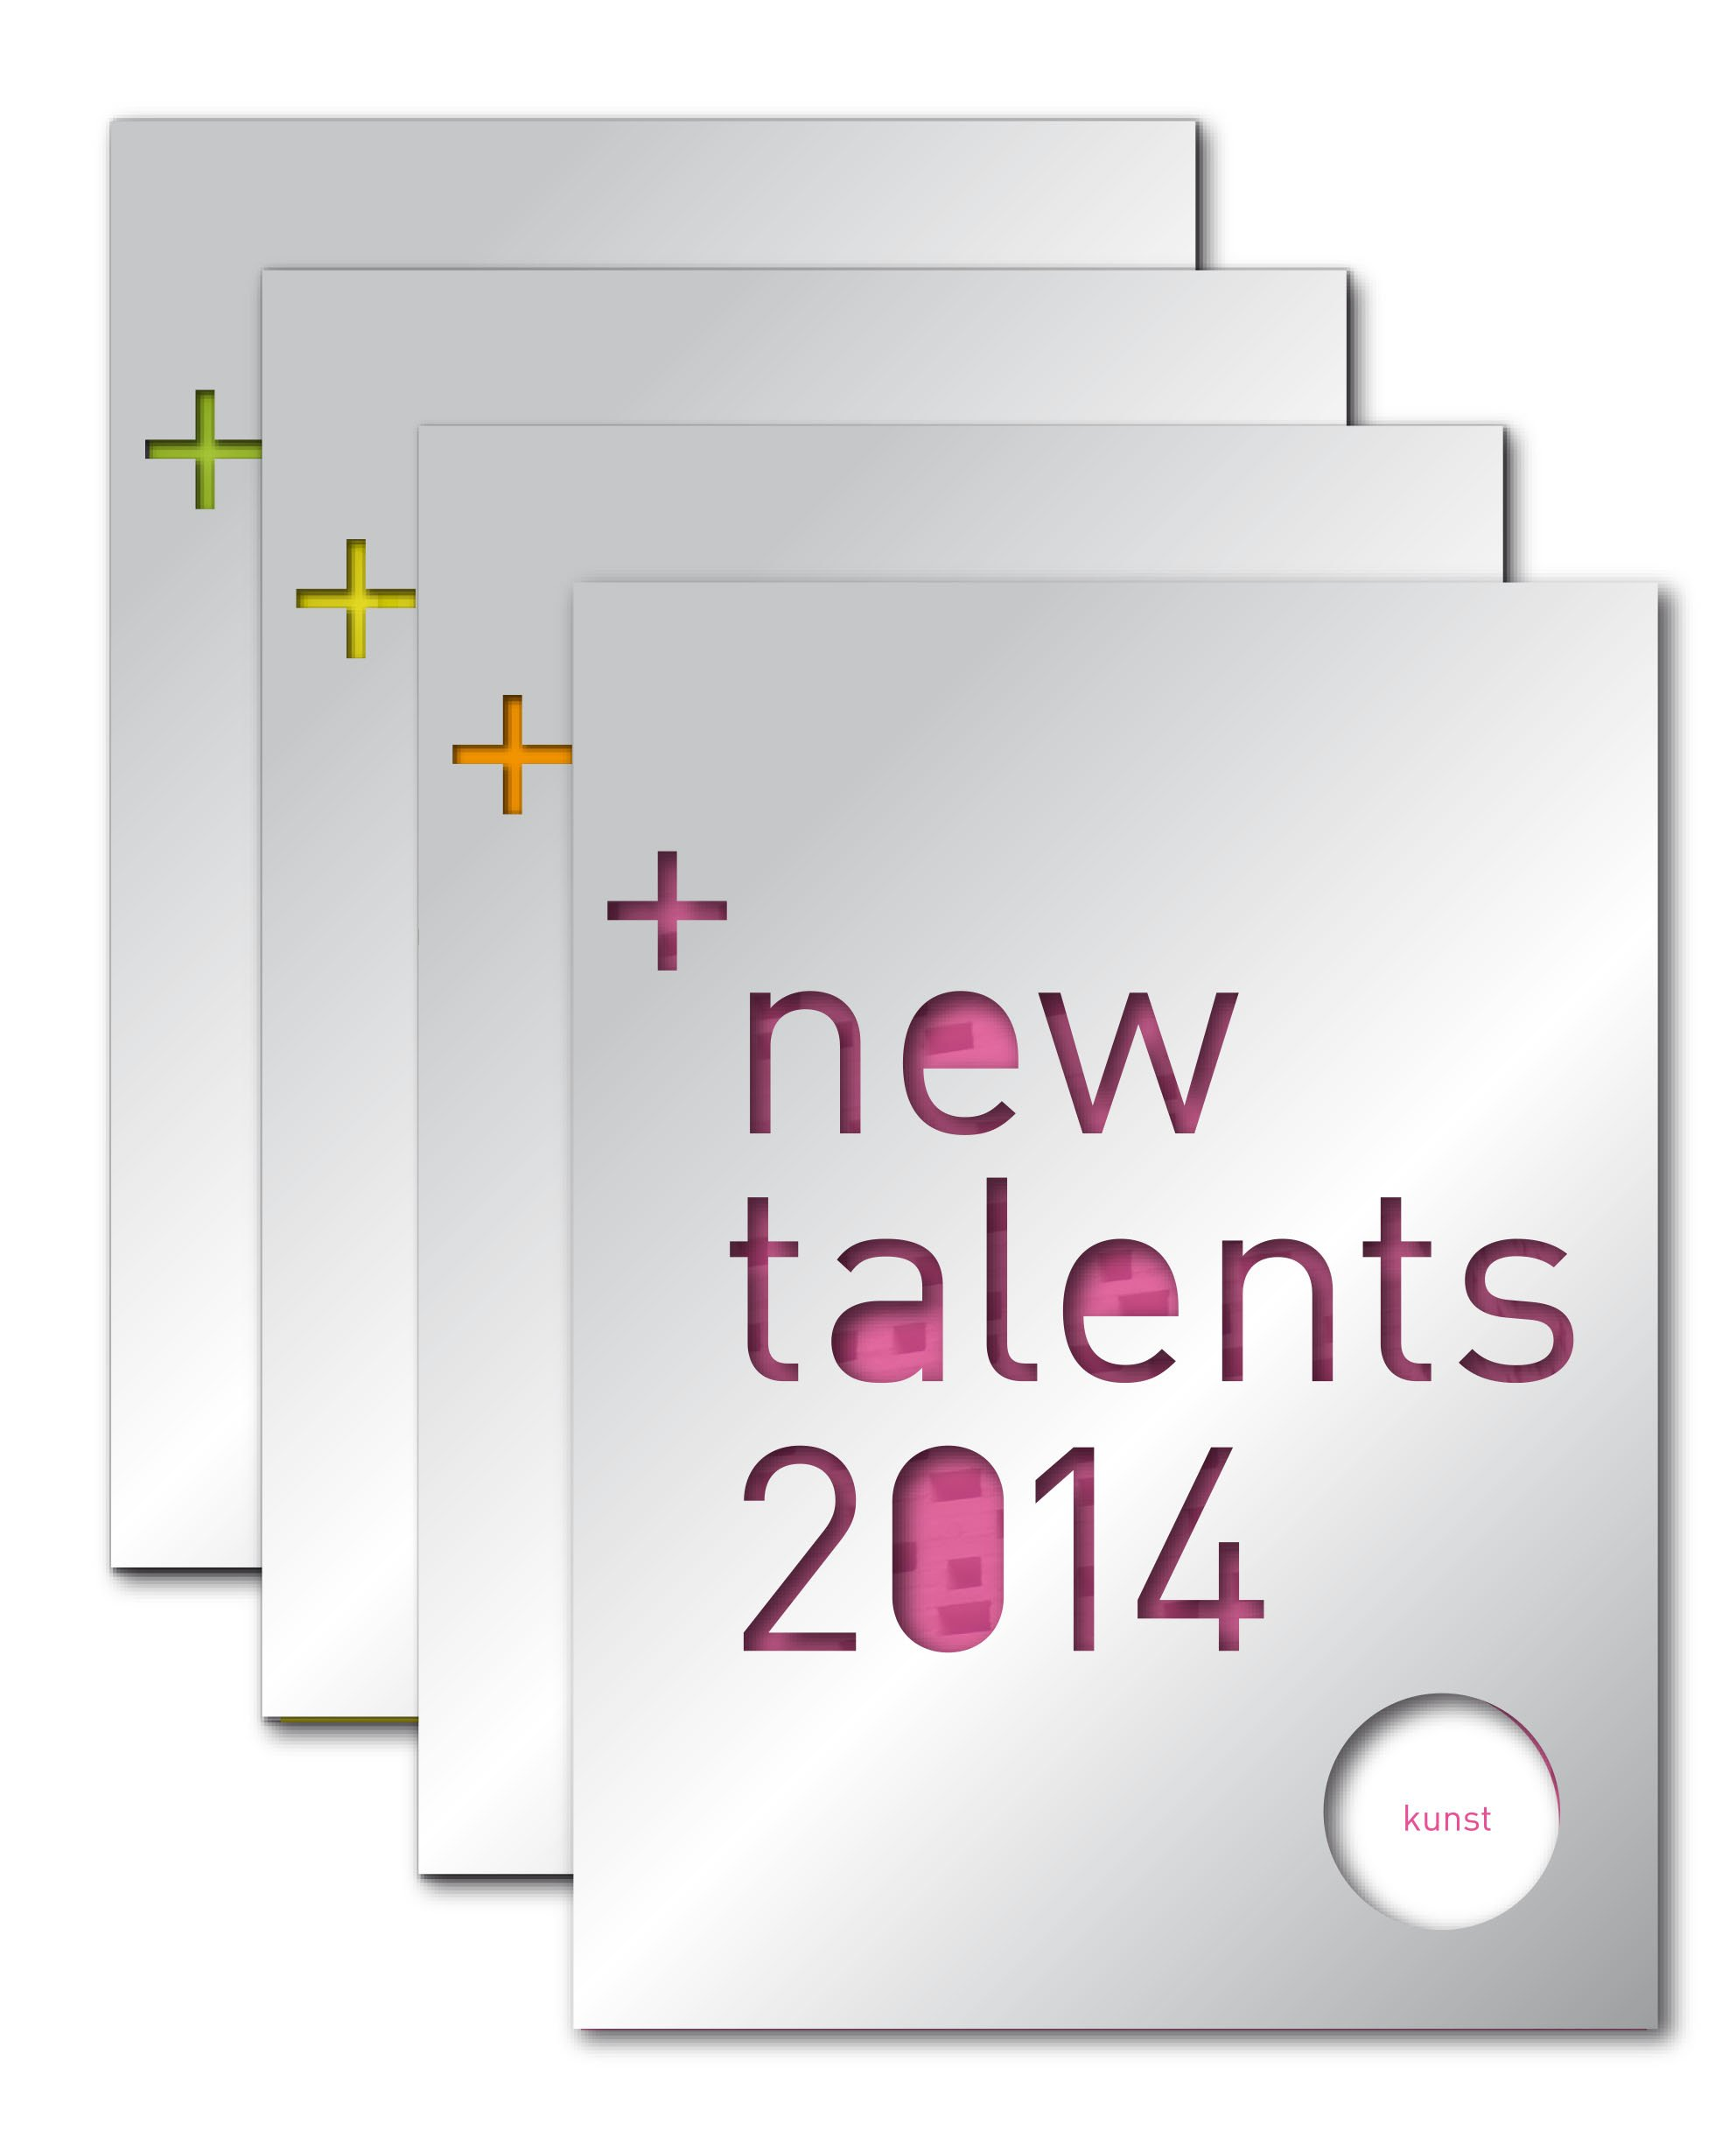 new talents 2014